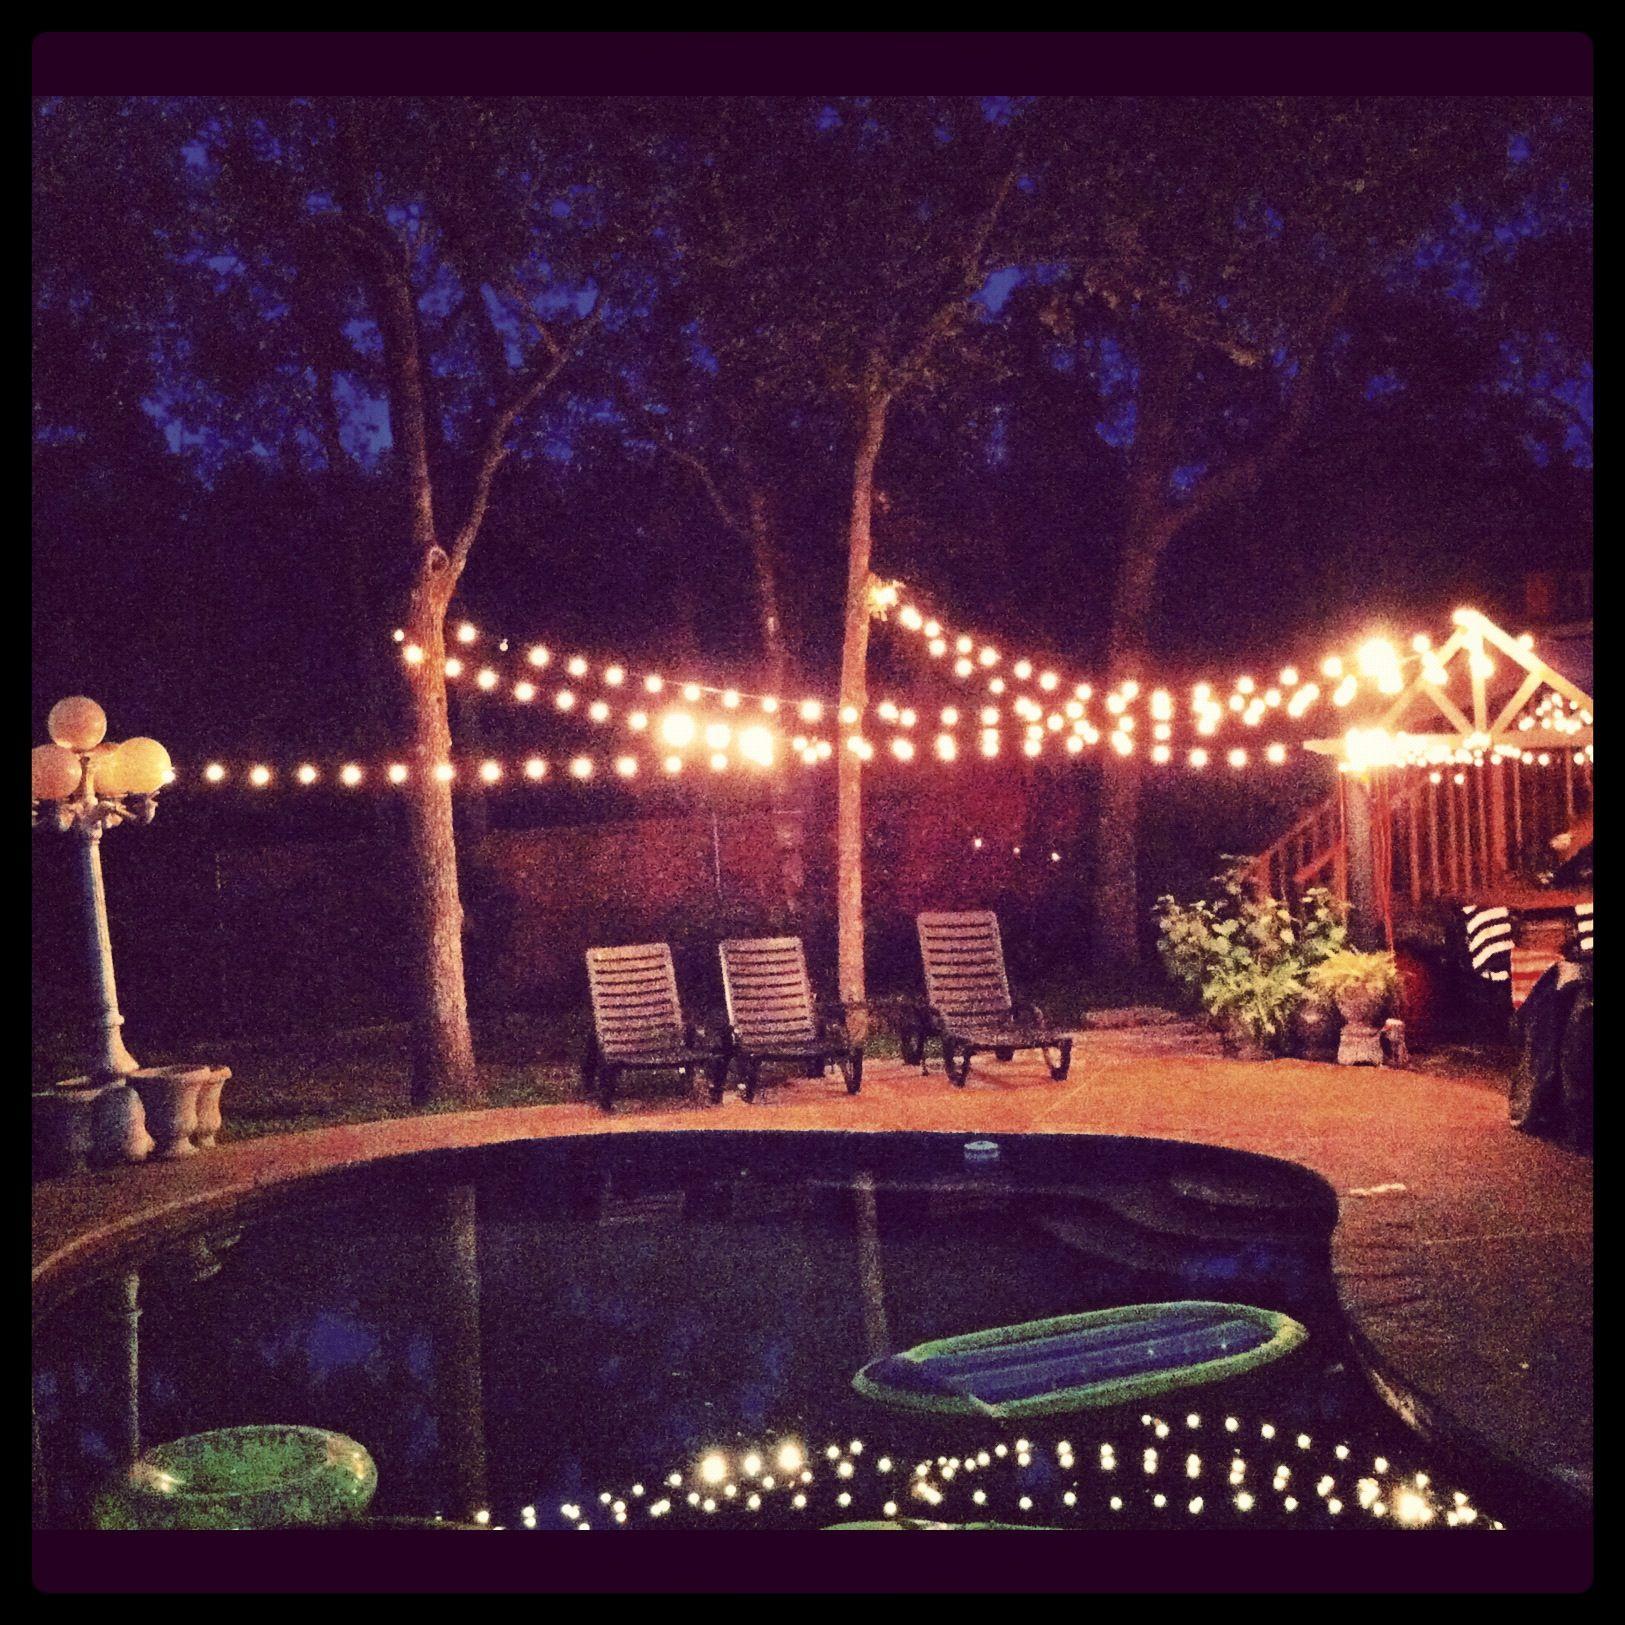 Backyard Party Ideas Lighting  Best 25 Backyard party lighting ideas on Pinterest